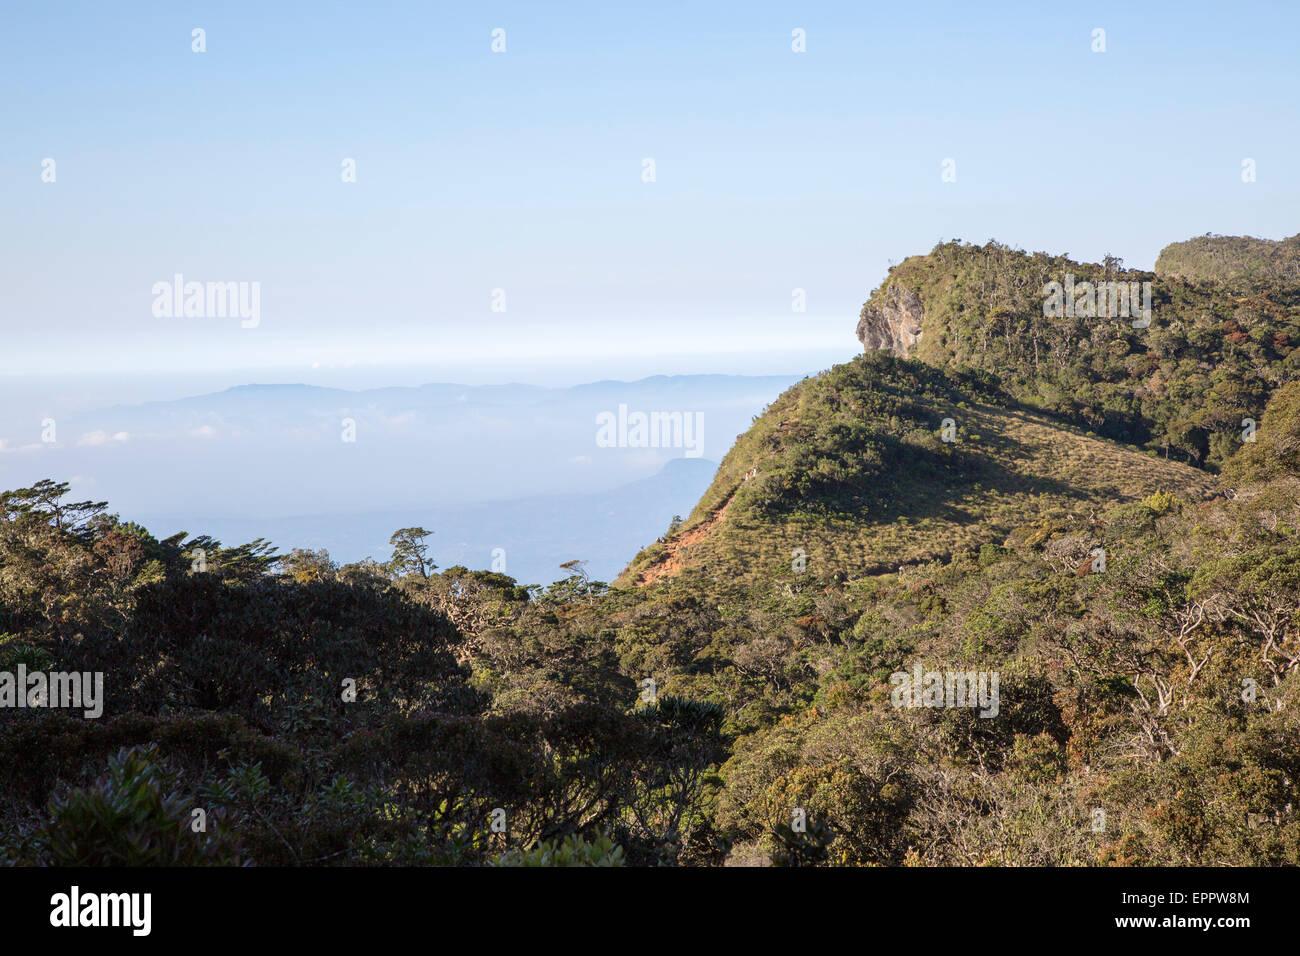 World's End cliff at Horton Plains national park, Sri Lanka, Asia Stock Photo